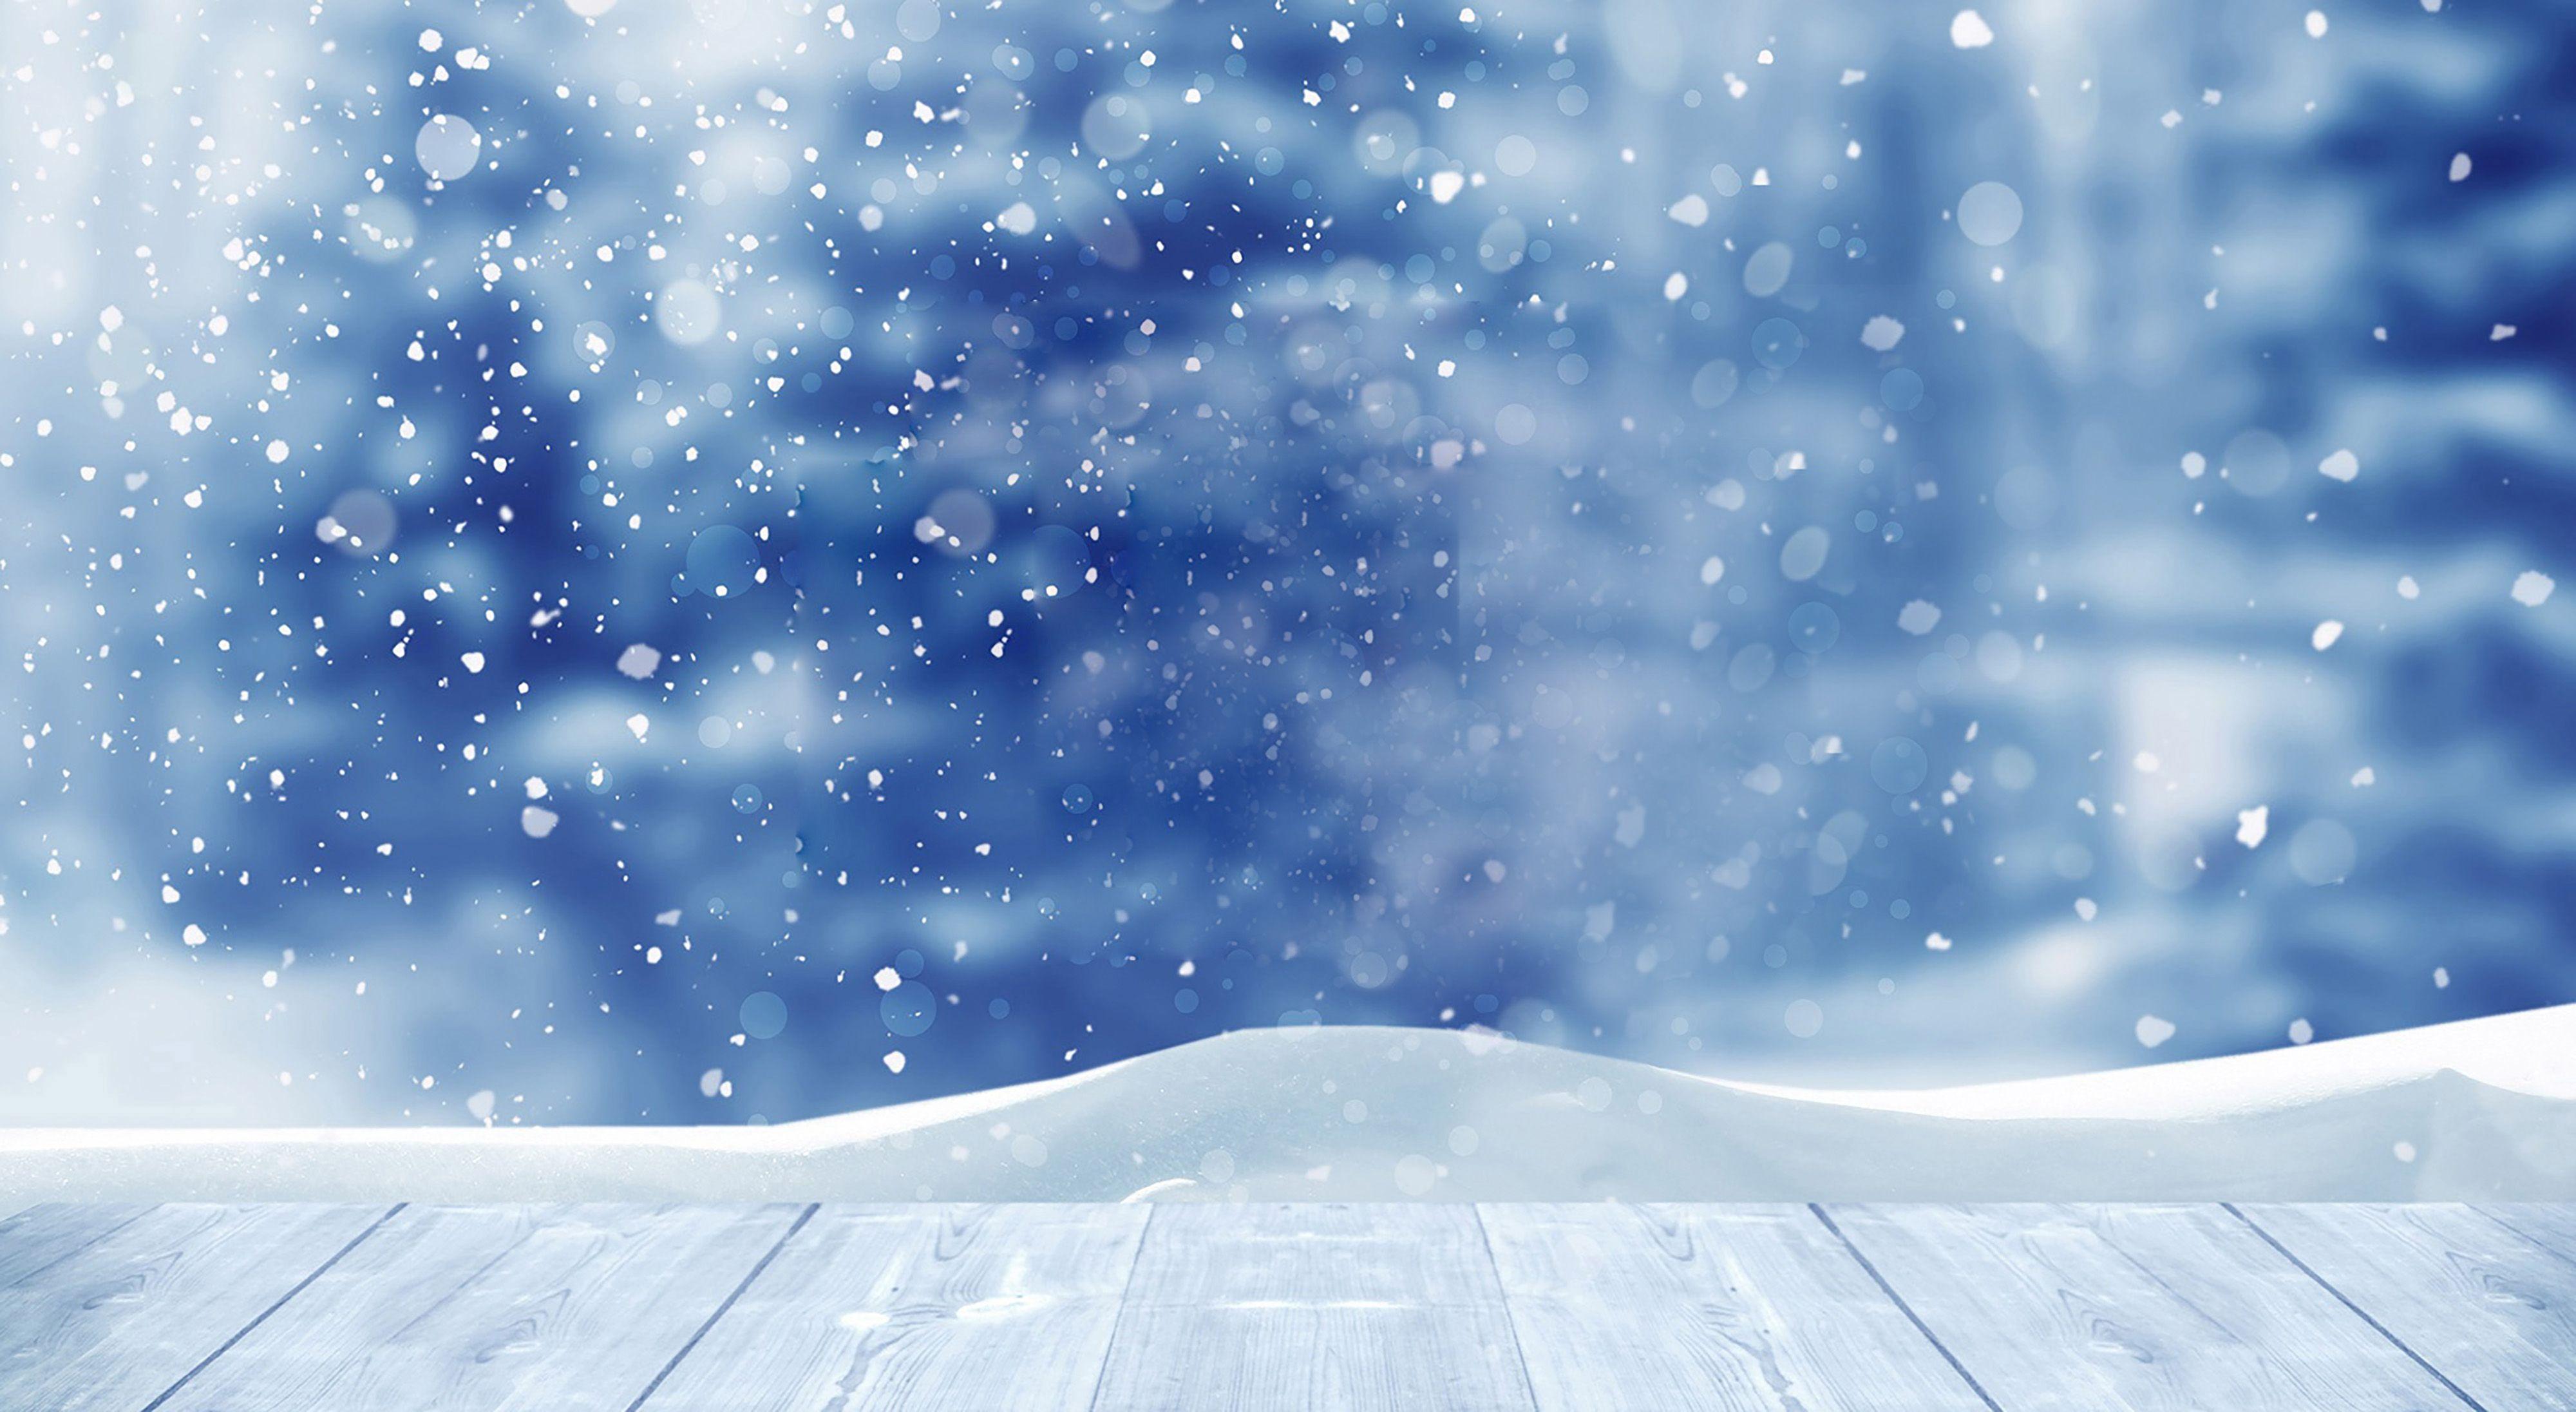 christmas eve snow day romantic creative background   Winter